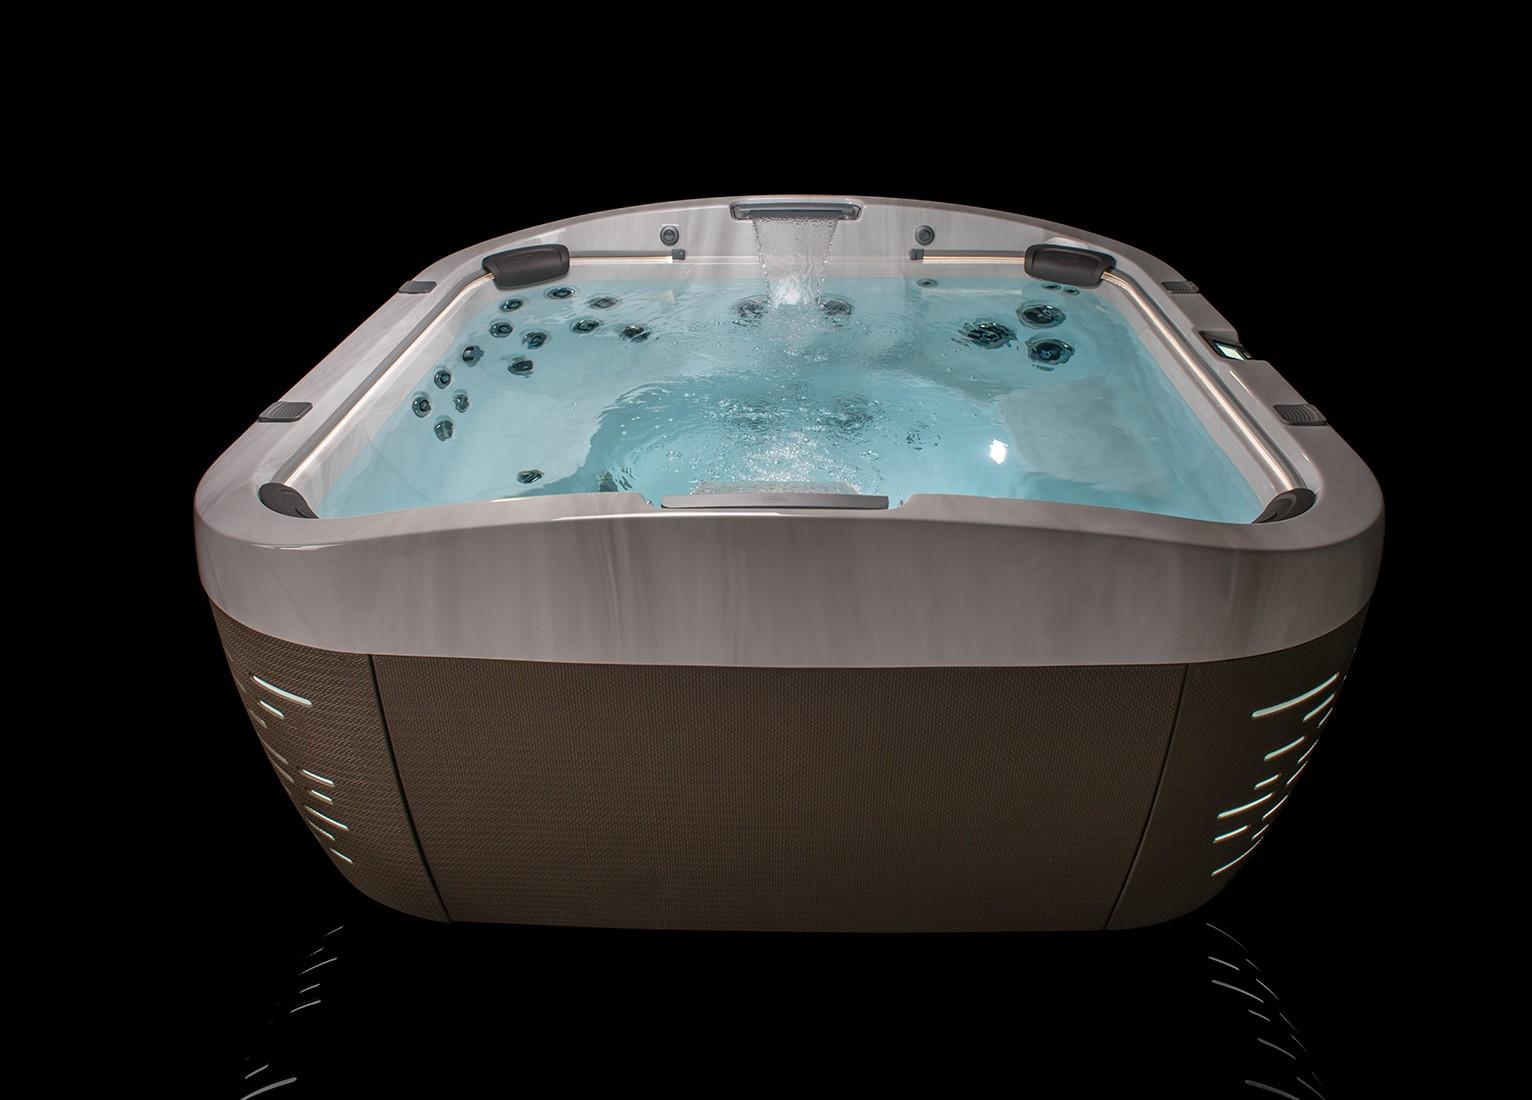 Jacuzzi J-585™ Hot Tub - Jacuzzi Hot Tubs - Pool City